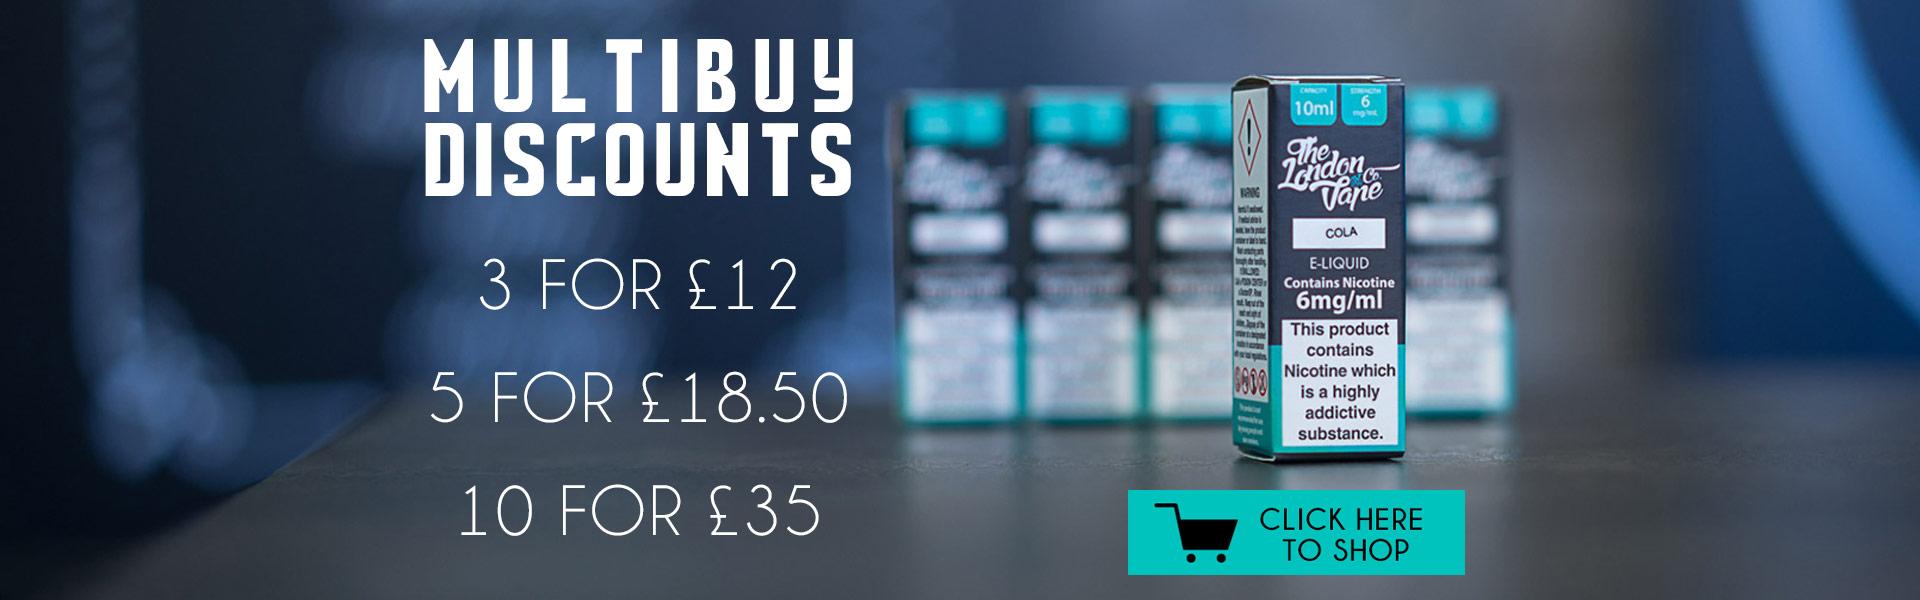 Bulk Discount Multi Buy Vape Co Liquids